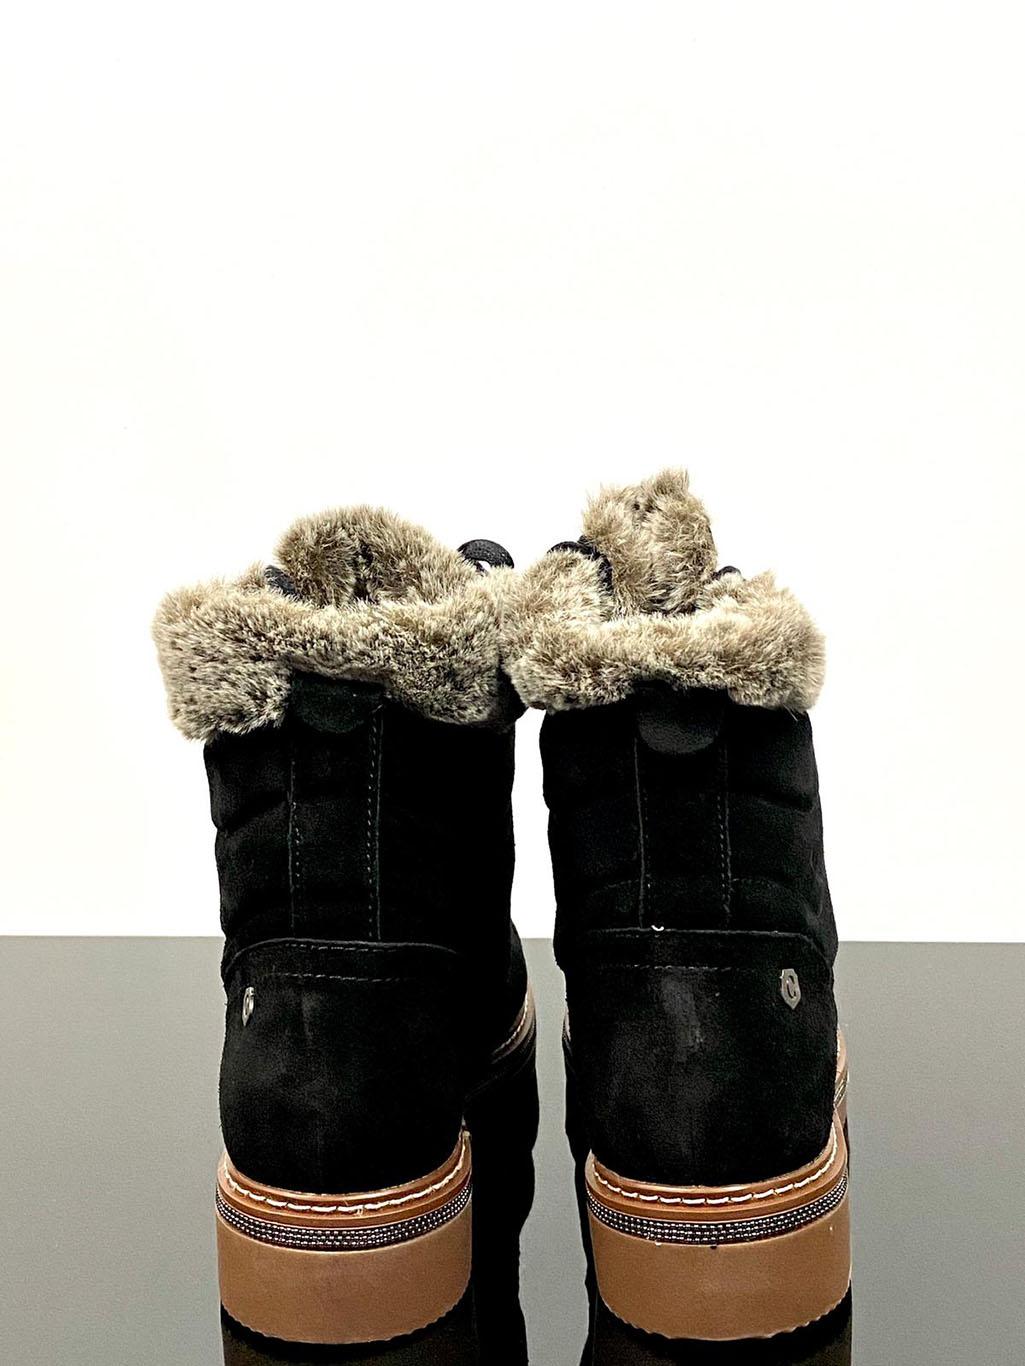 Carmela Caprice Black Leather Ankle Boot Main